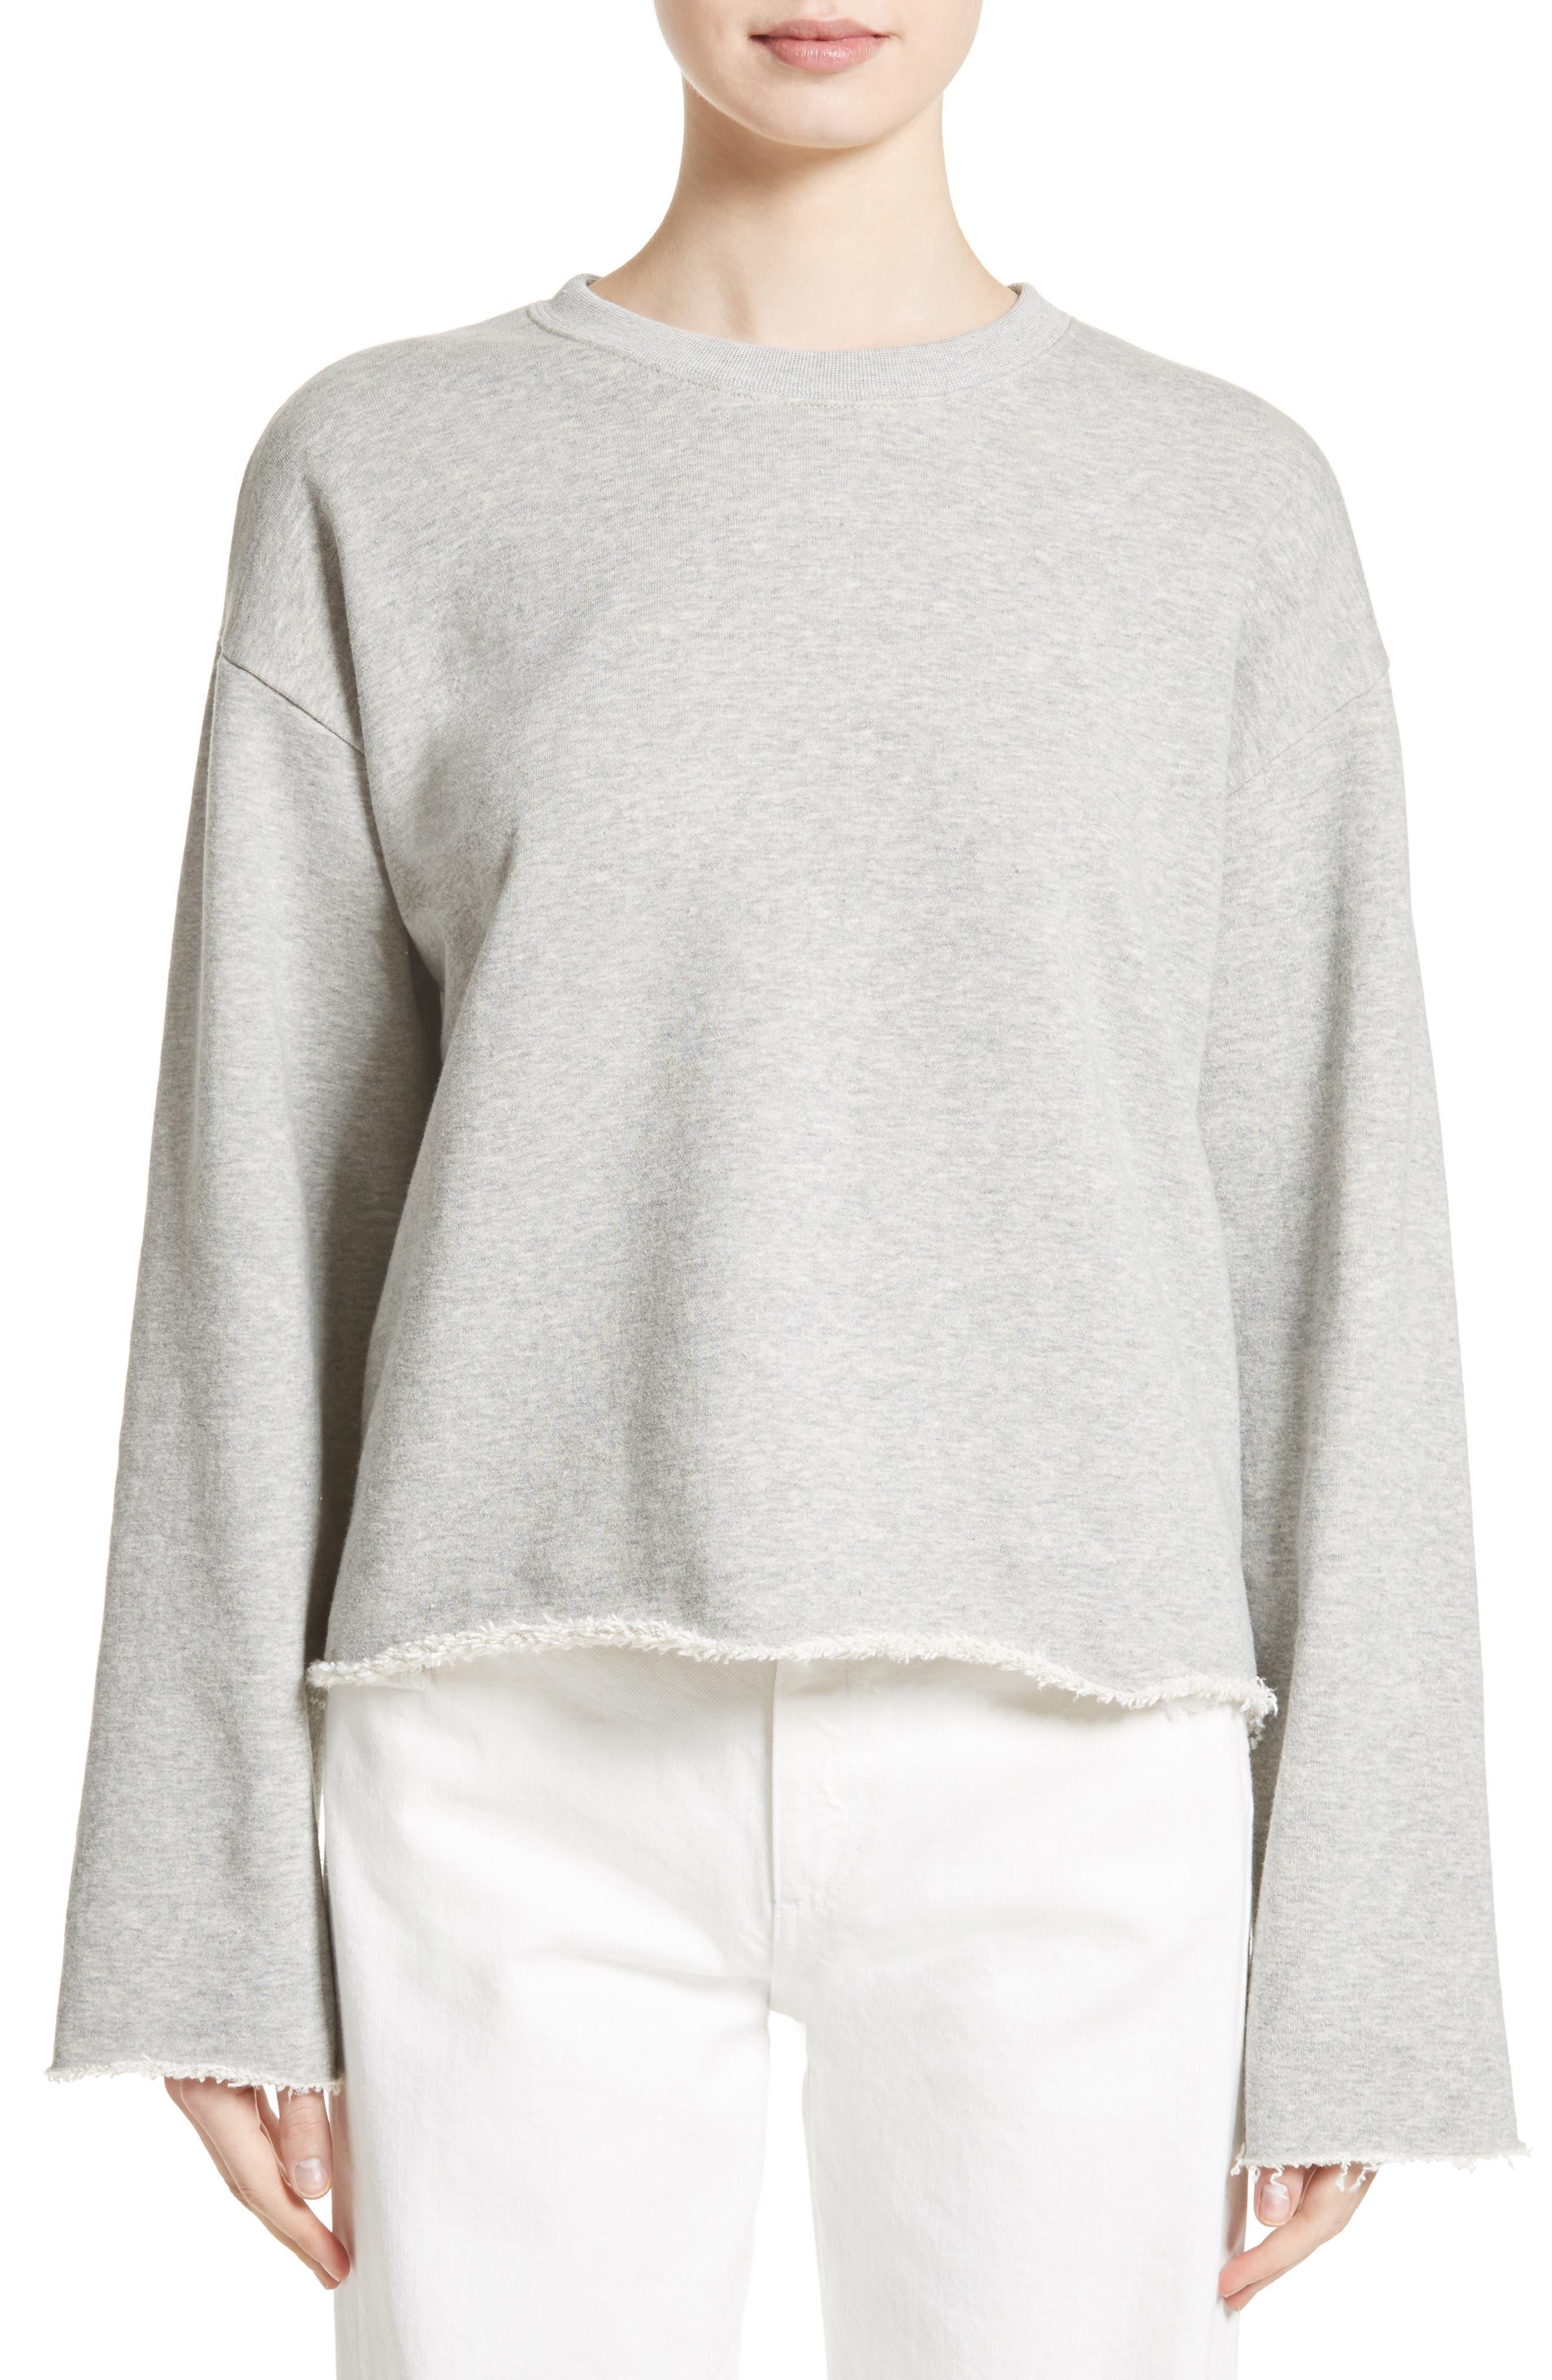 Alternate Image 1 Selected - Simon Miller Calvin Sweatshirt